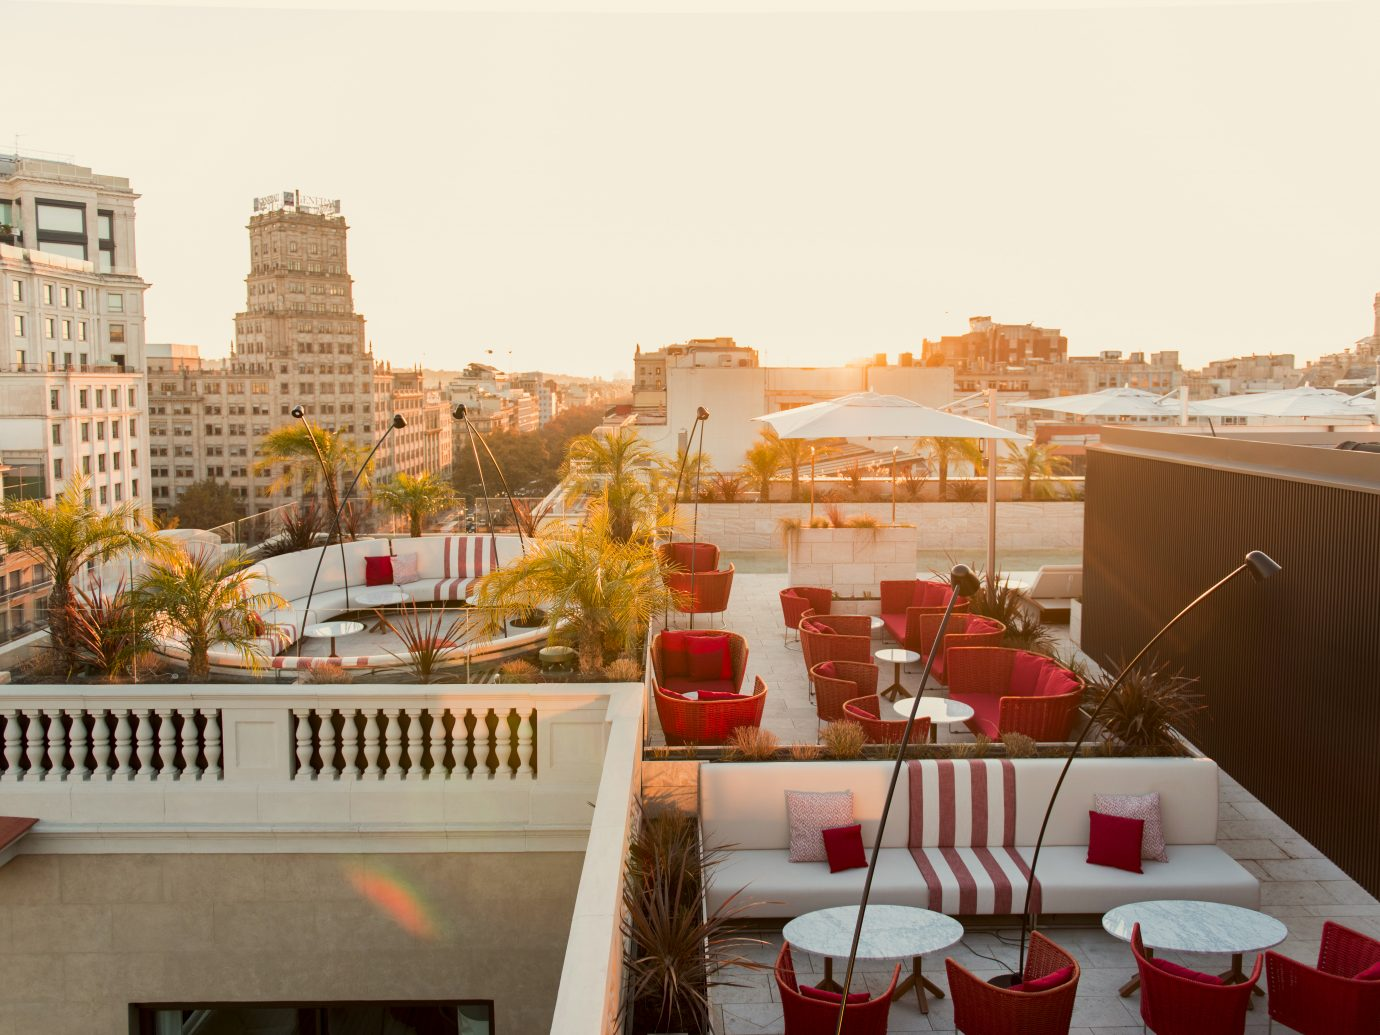 Azimuth, Pool and Rooftop Bar, Almanac Hotel, Barcelona